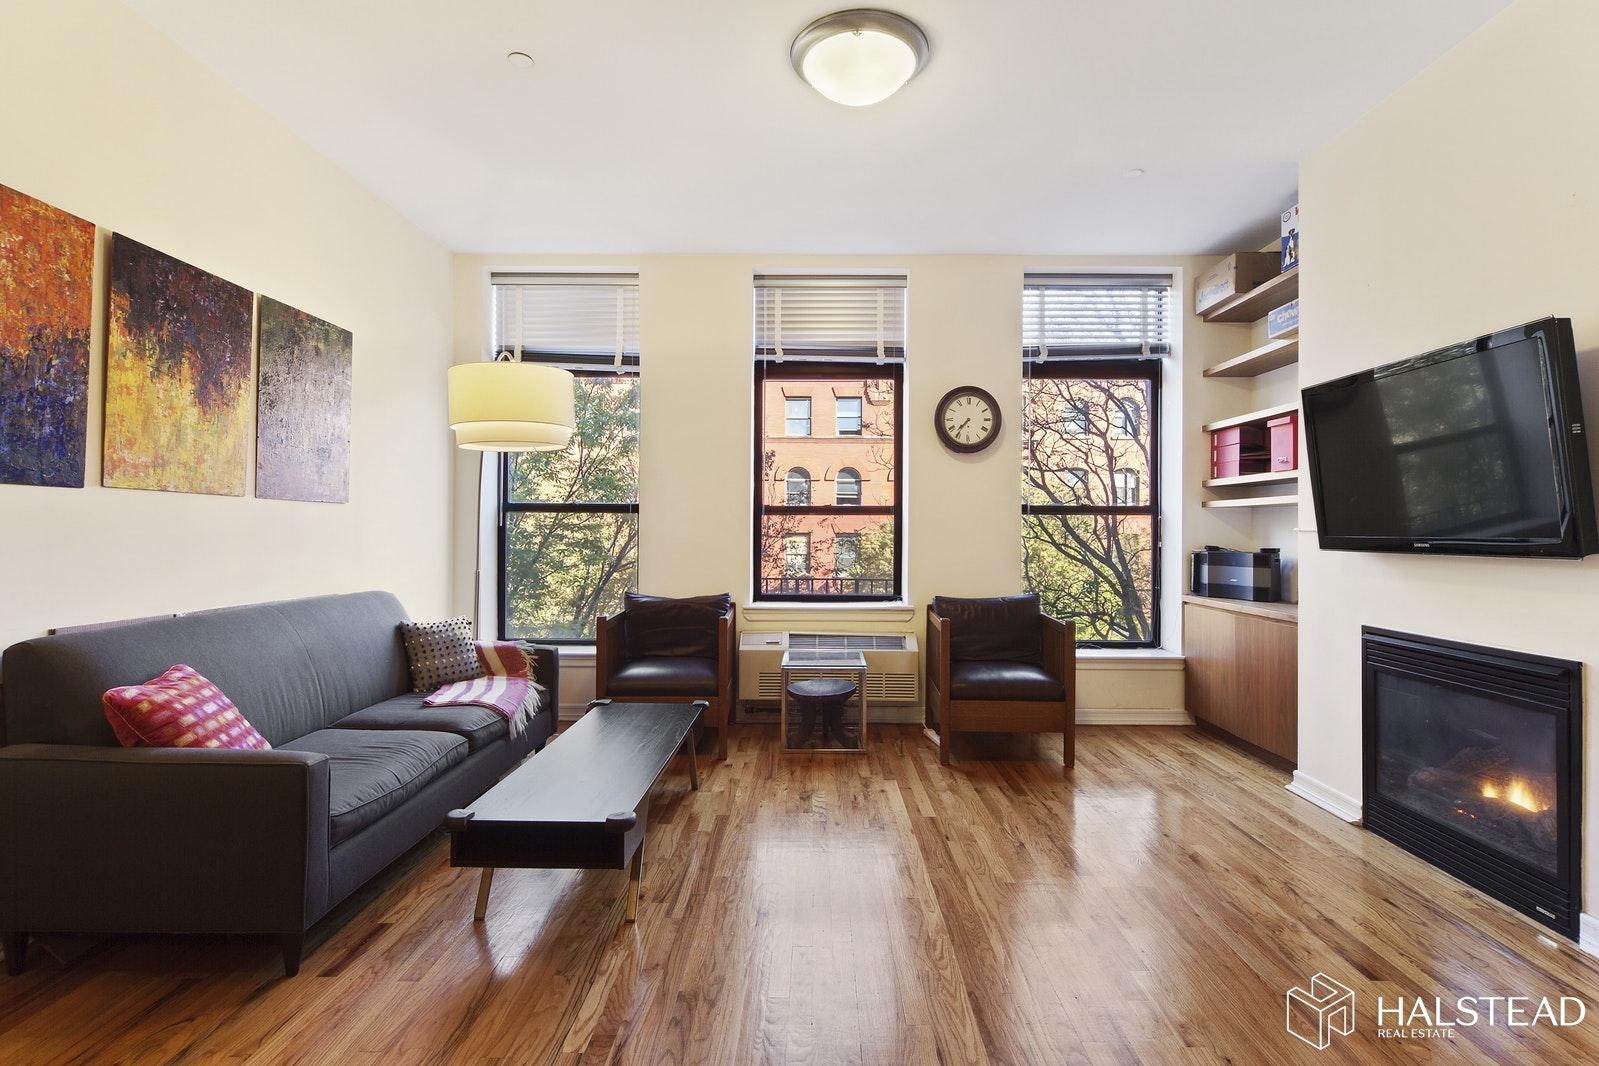 222 West 135th Street, Apt 3B, Manhattan, New York 10030